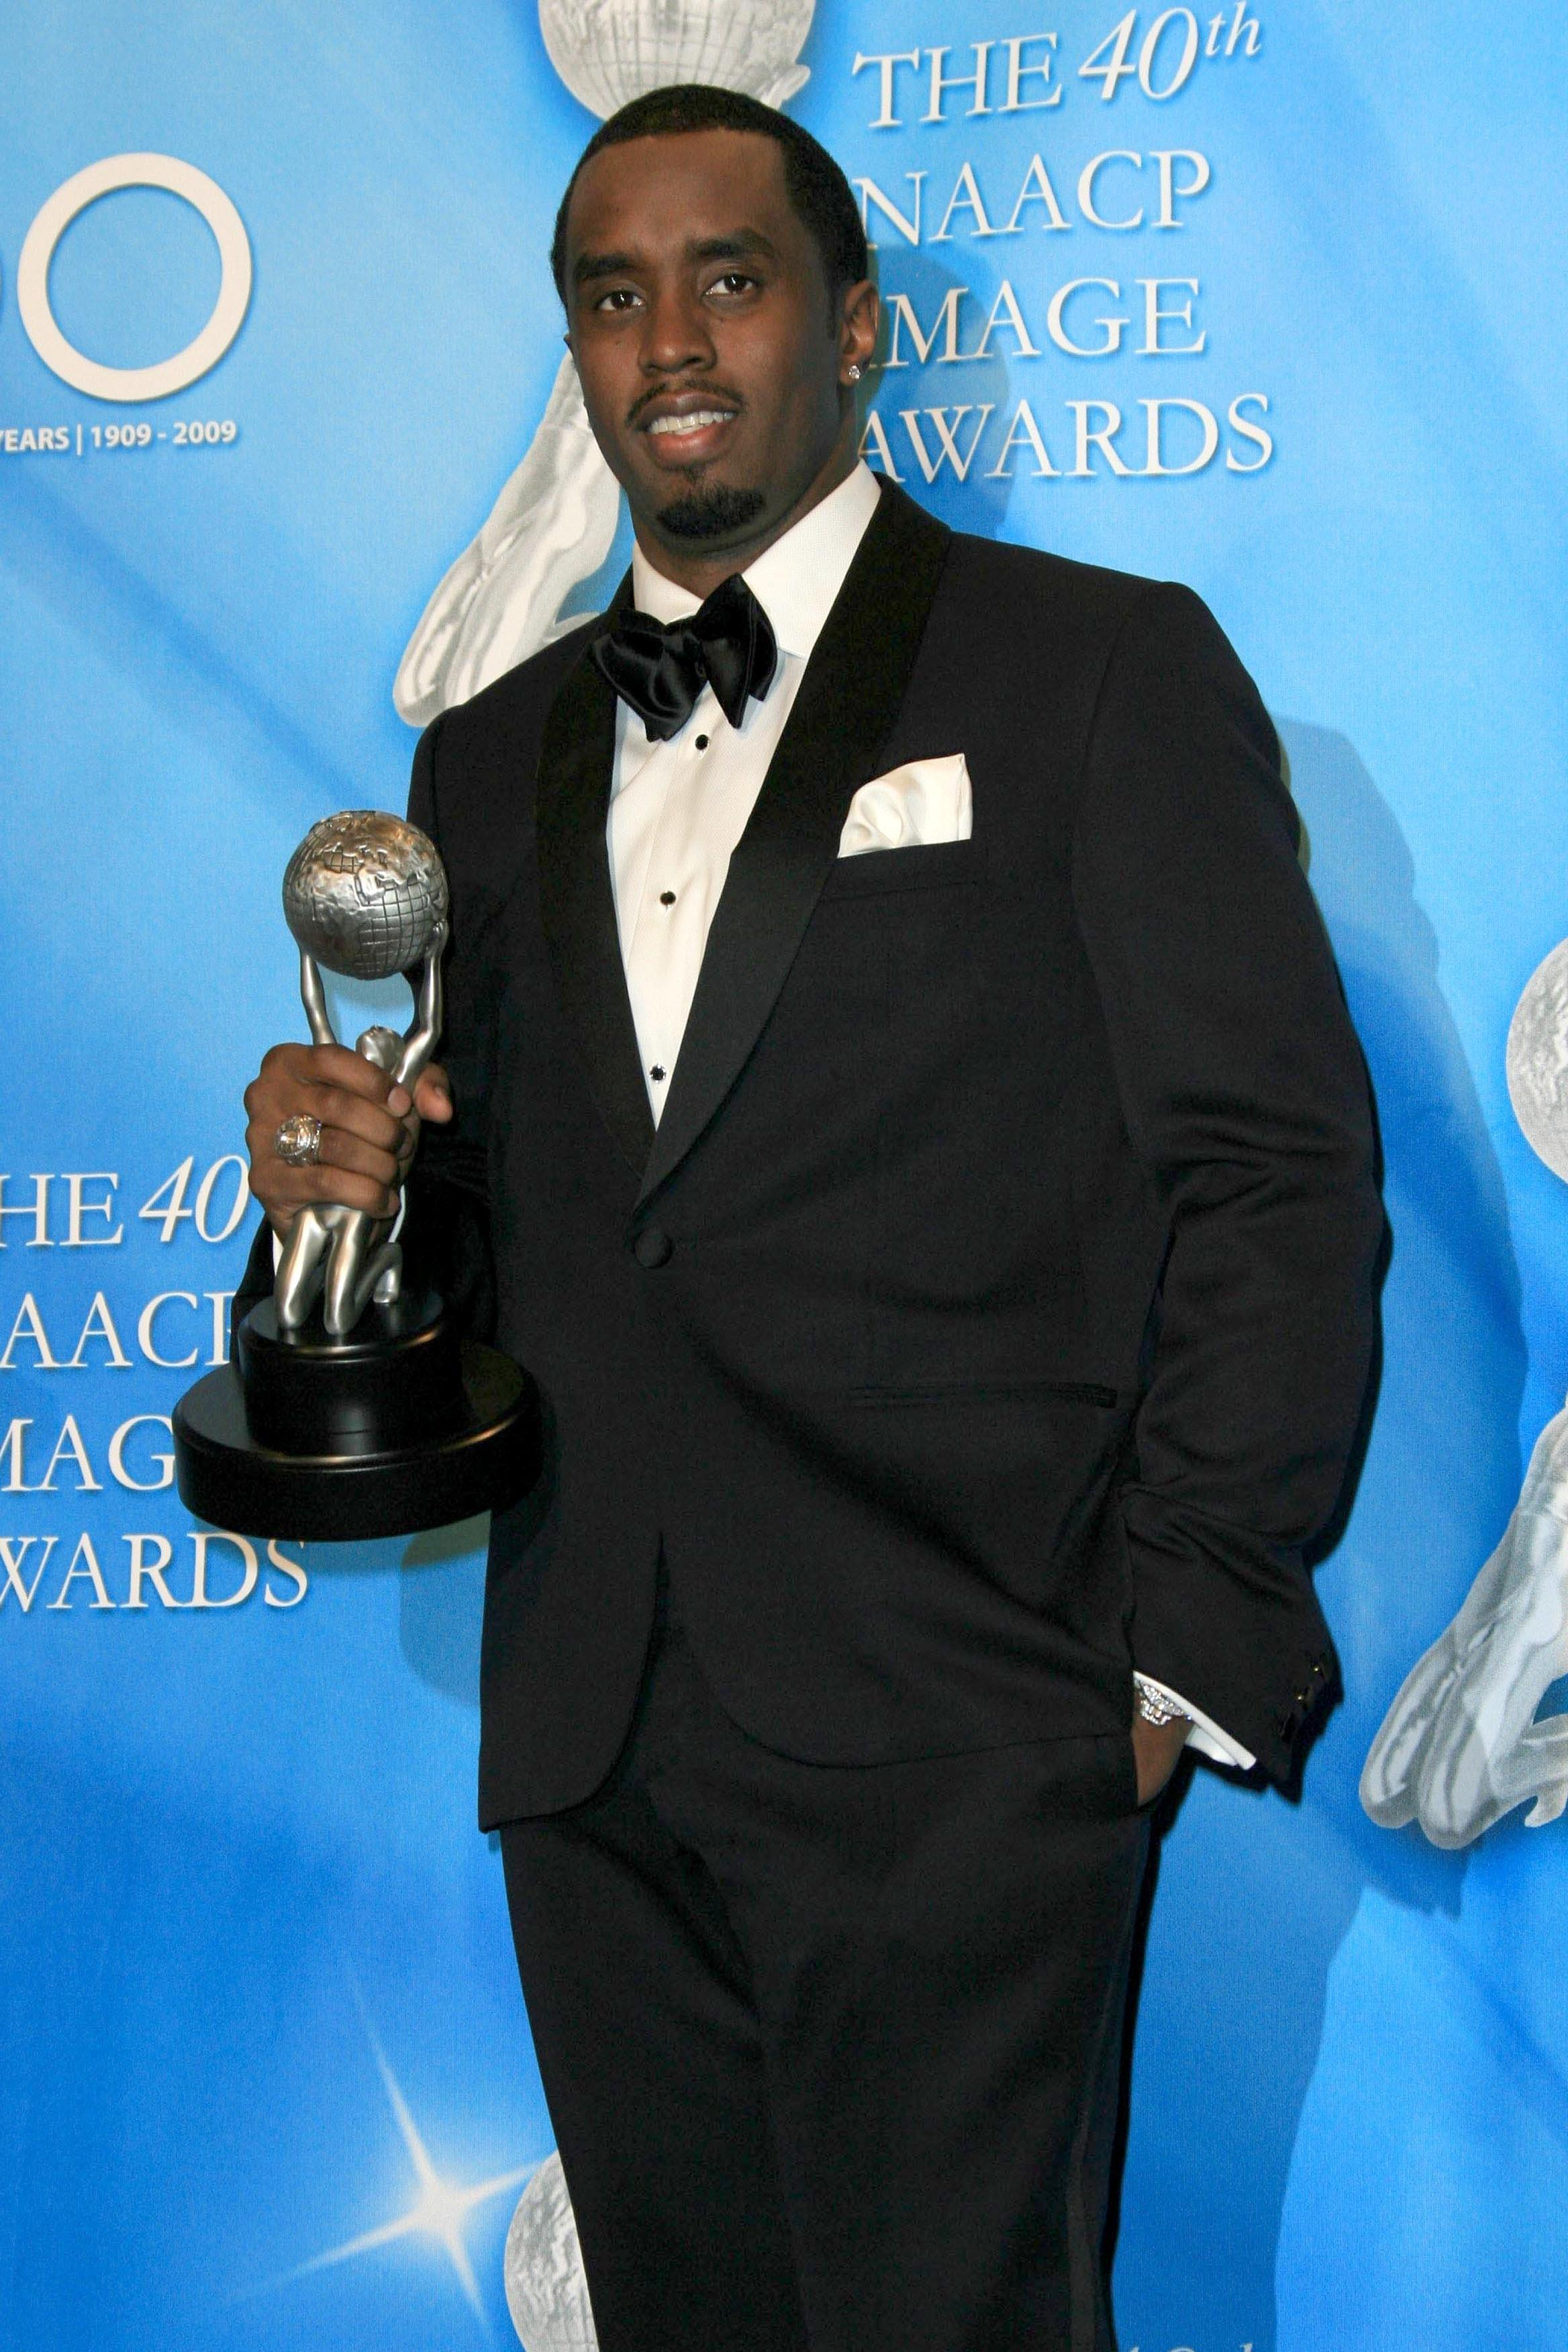 NAACP Nominations